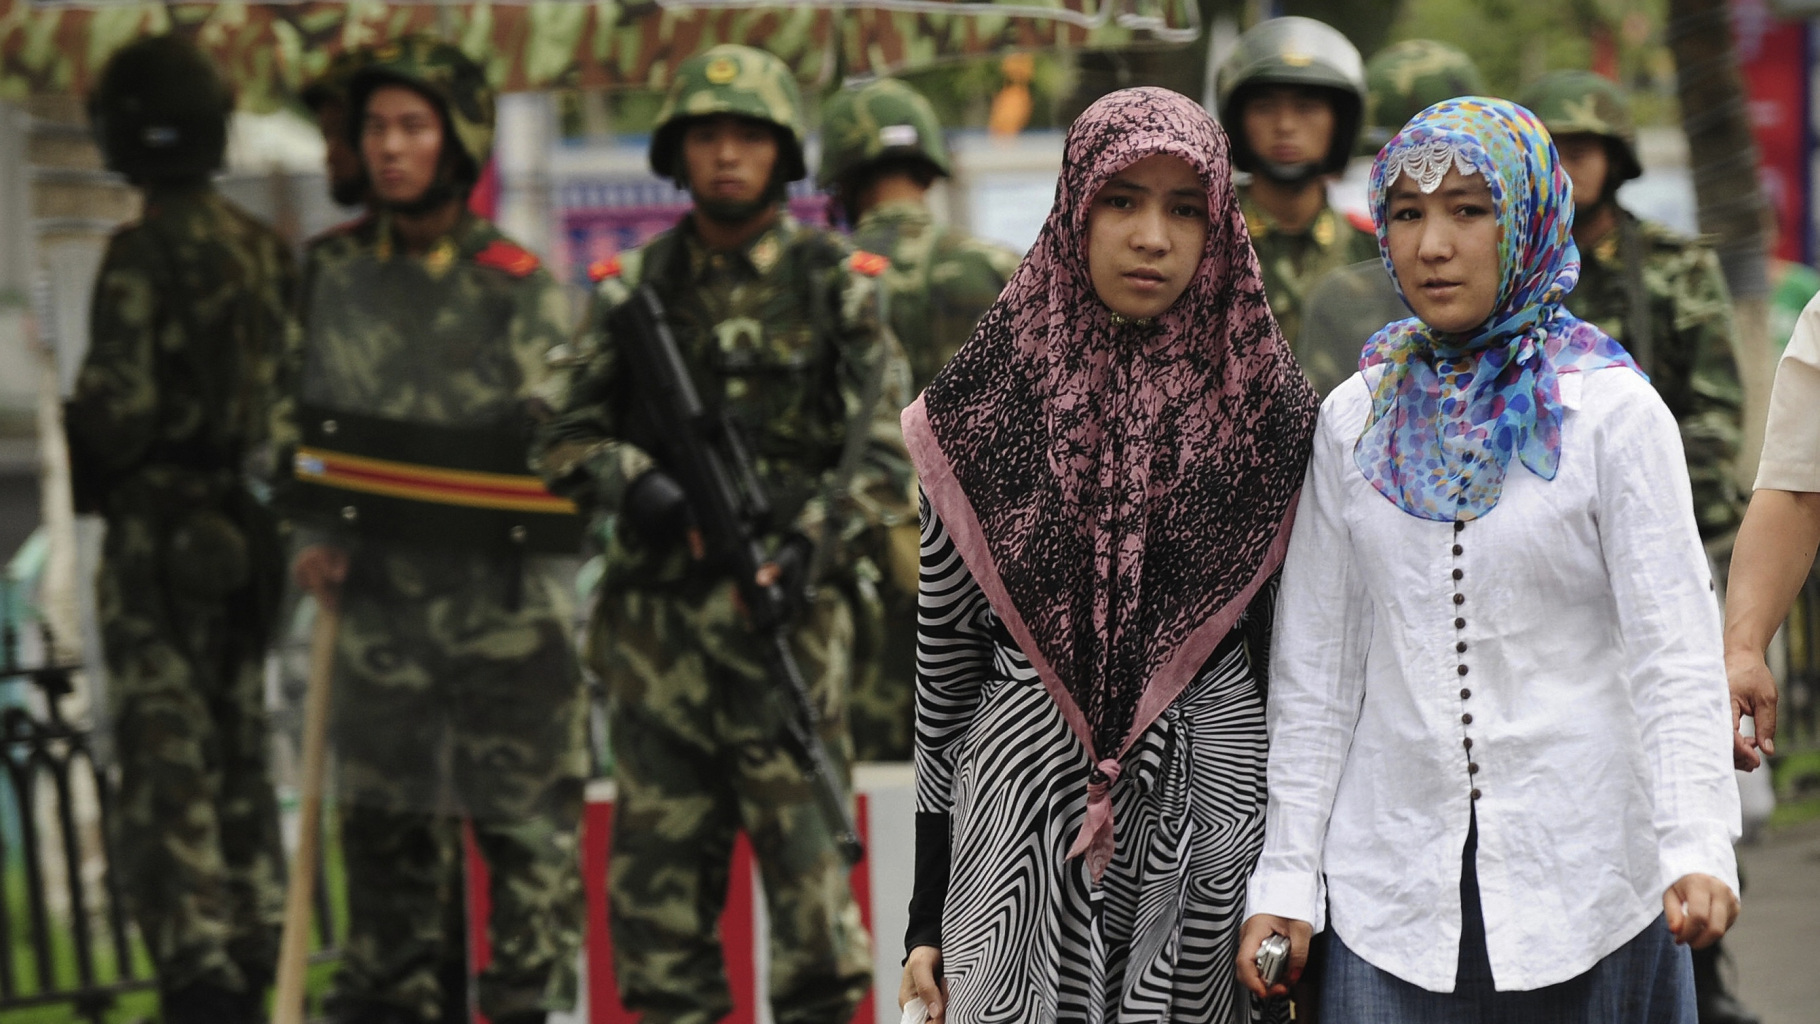 2009年7月14日,兩名新疆婦女路過烏魯木齊的軍警防線。(AFP PHOTO / Peter PARKS/ Getty Images)